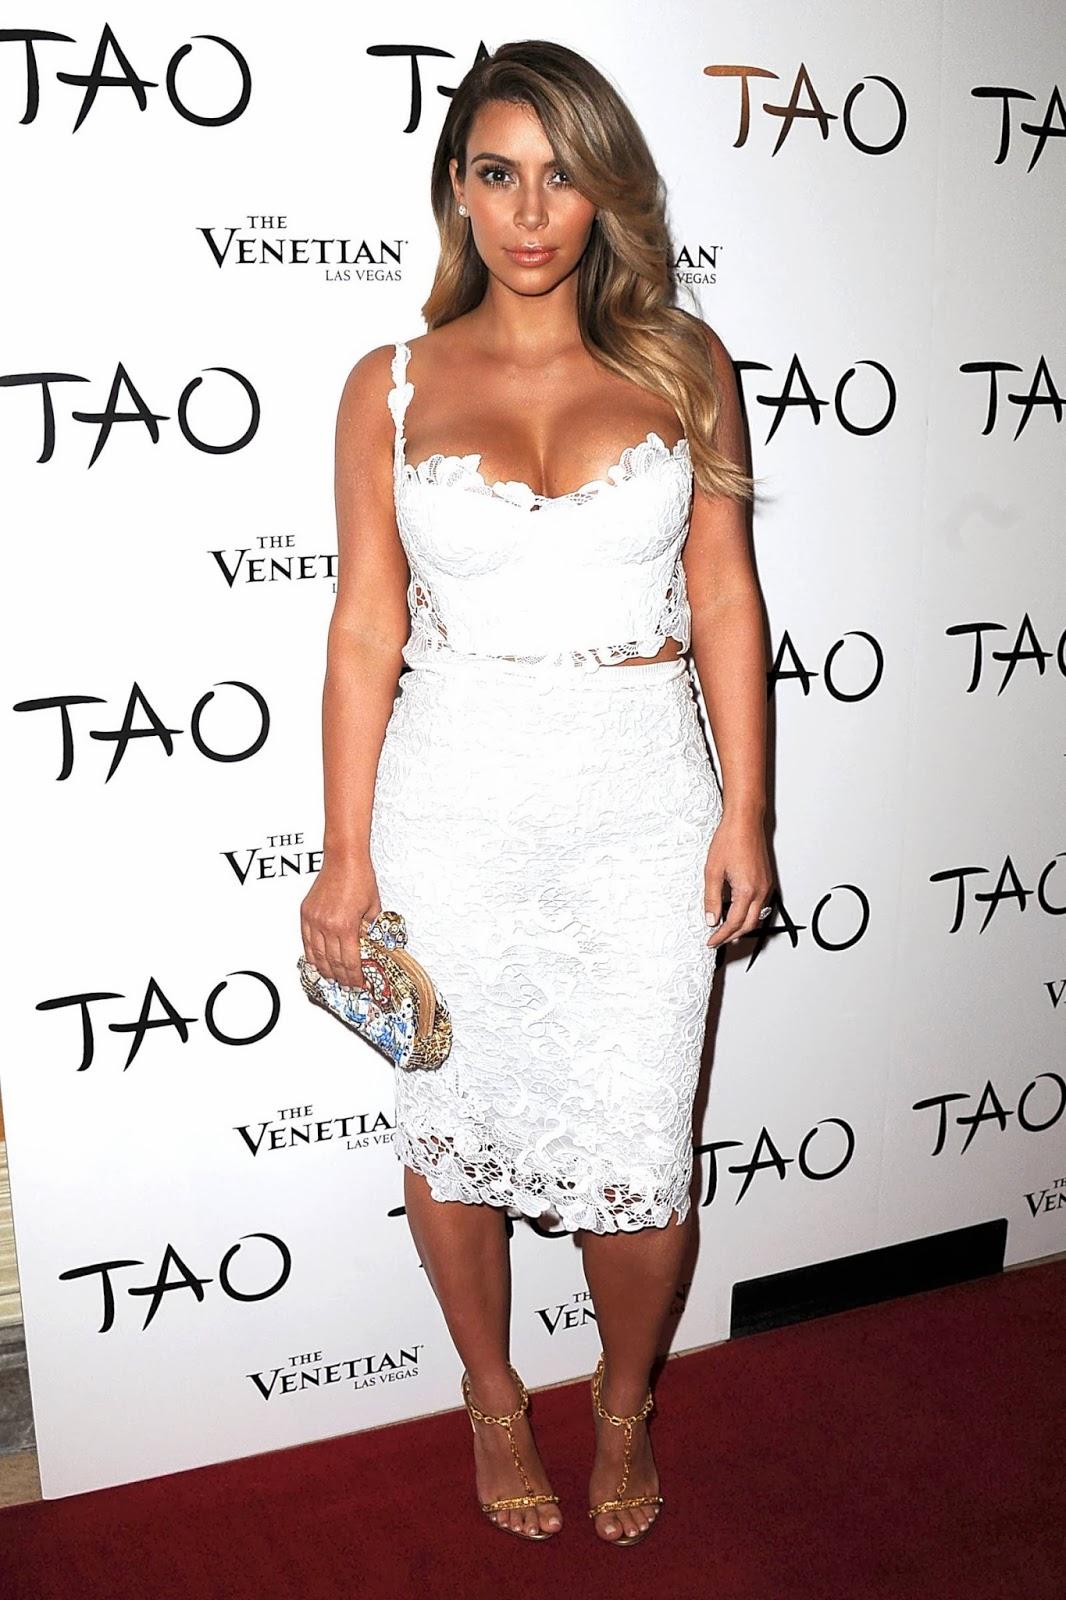 Kim Kardashian Birthday Party in Las Vegas Photos - Hot